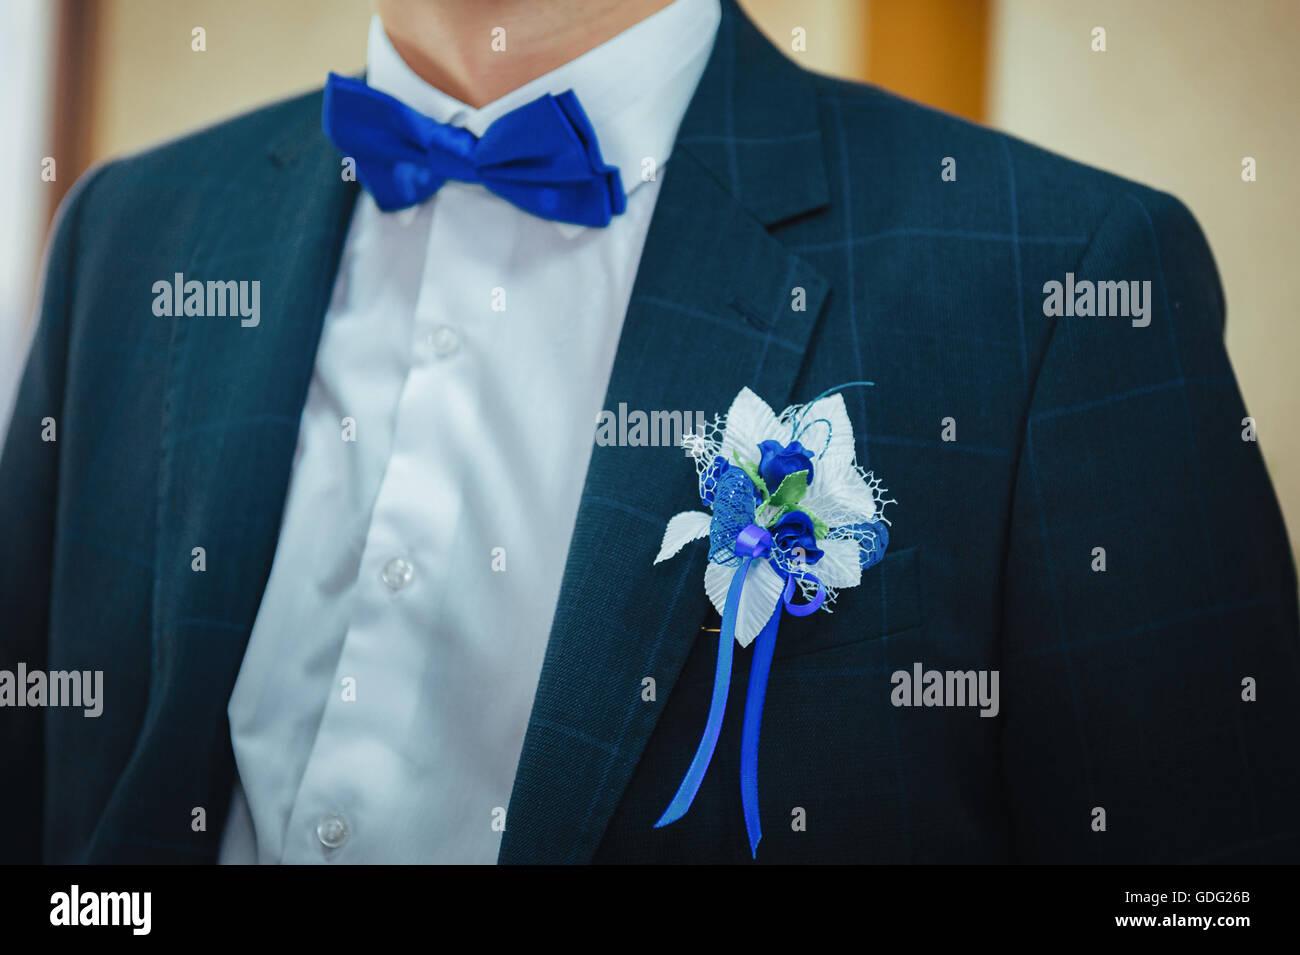 Grooms Wedding Day Buttonhole Stock Photos & Grooms Wedding Day ...